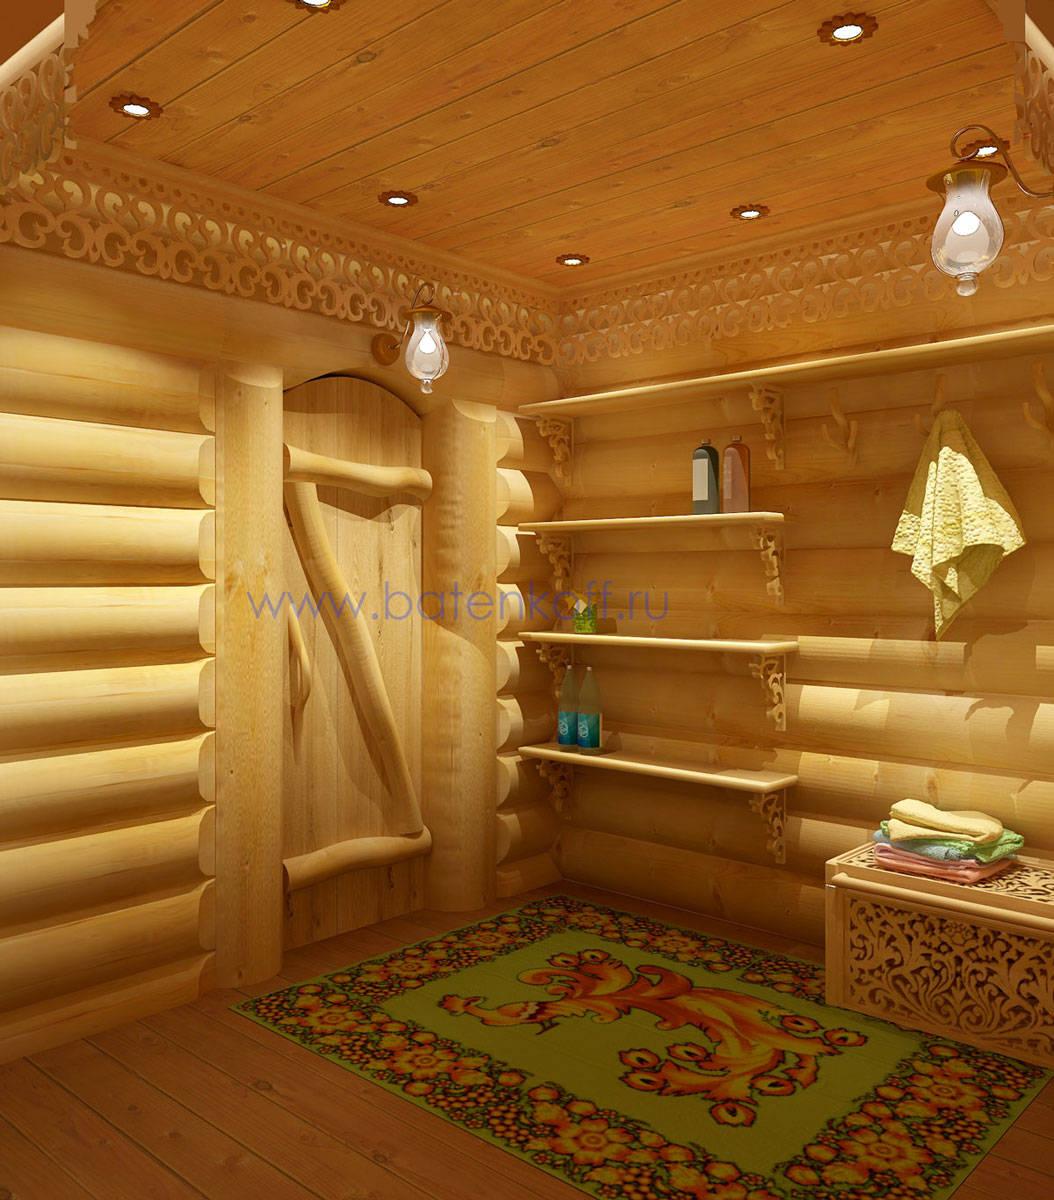 Дизайн русской бани внутри фото 194